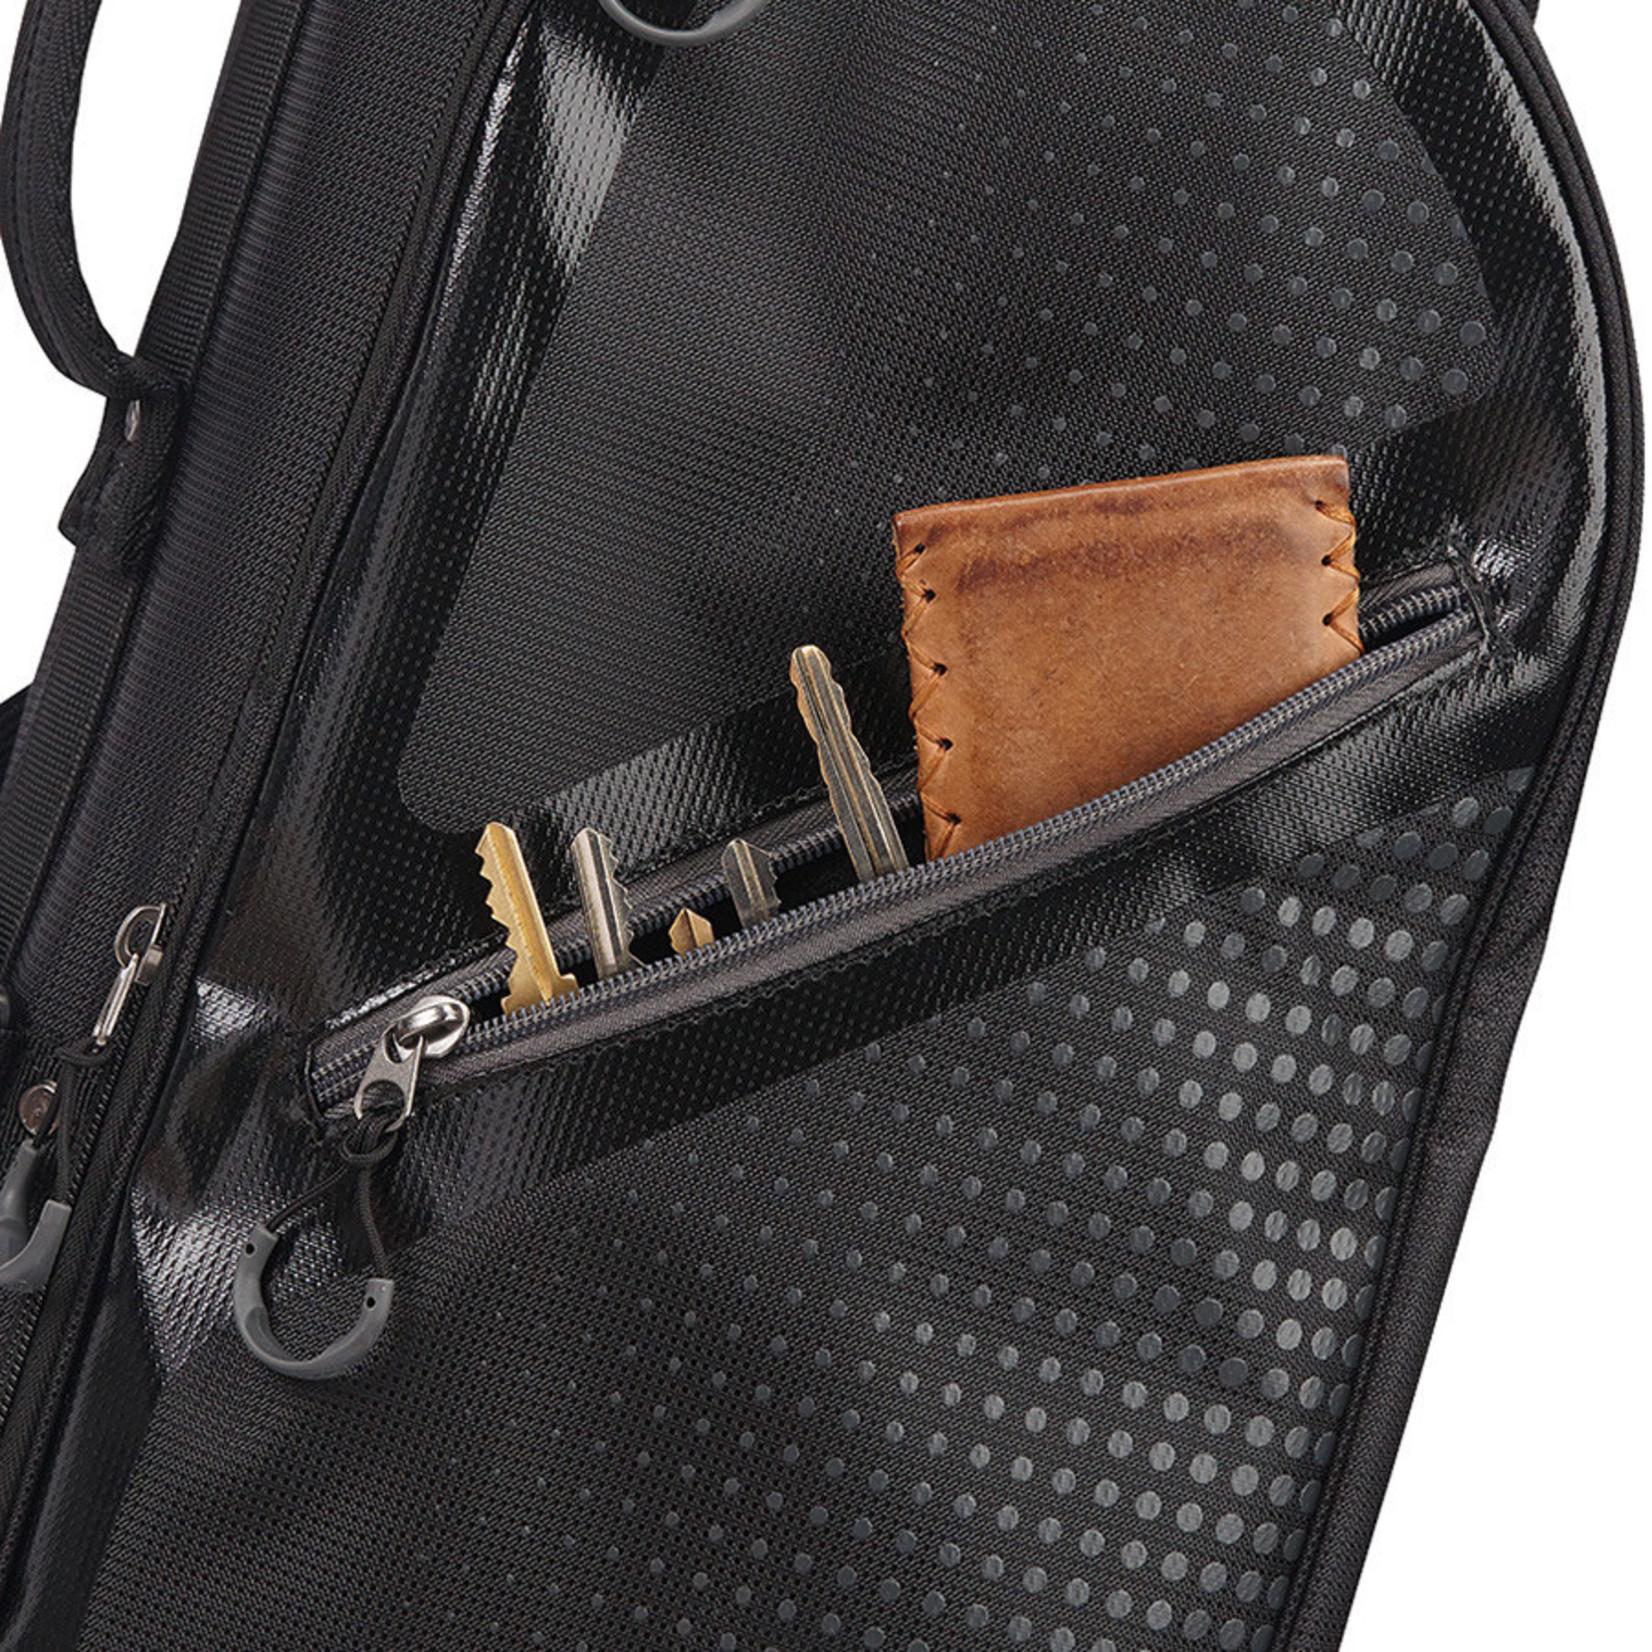 TaylorMade Quiver Bag